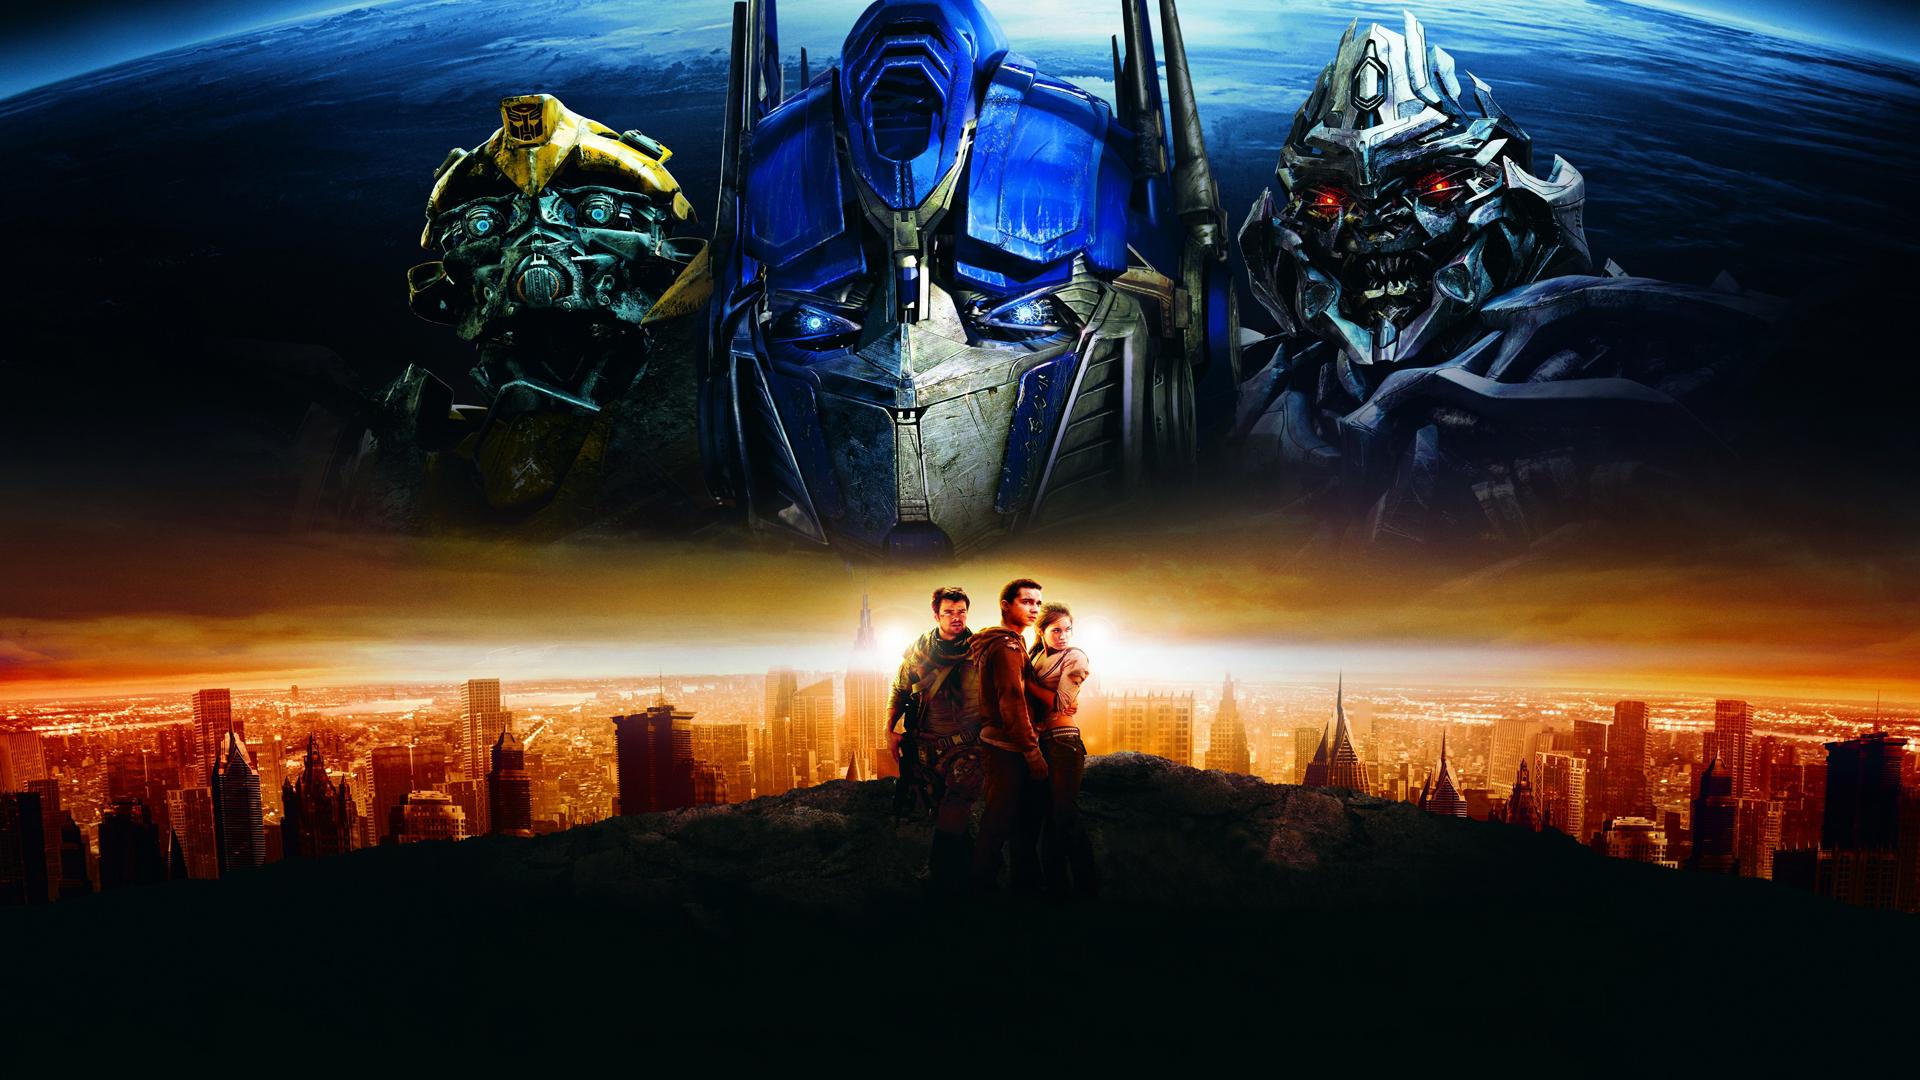 48+] Transformers Phone Wallpaper on